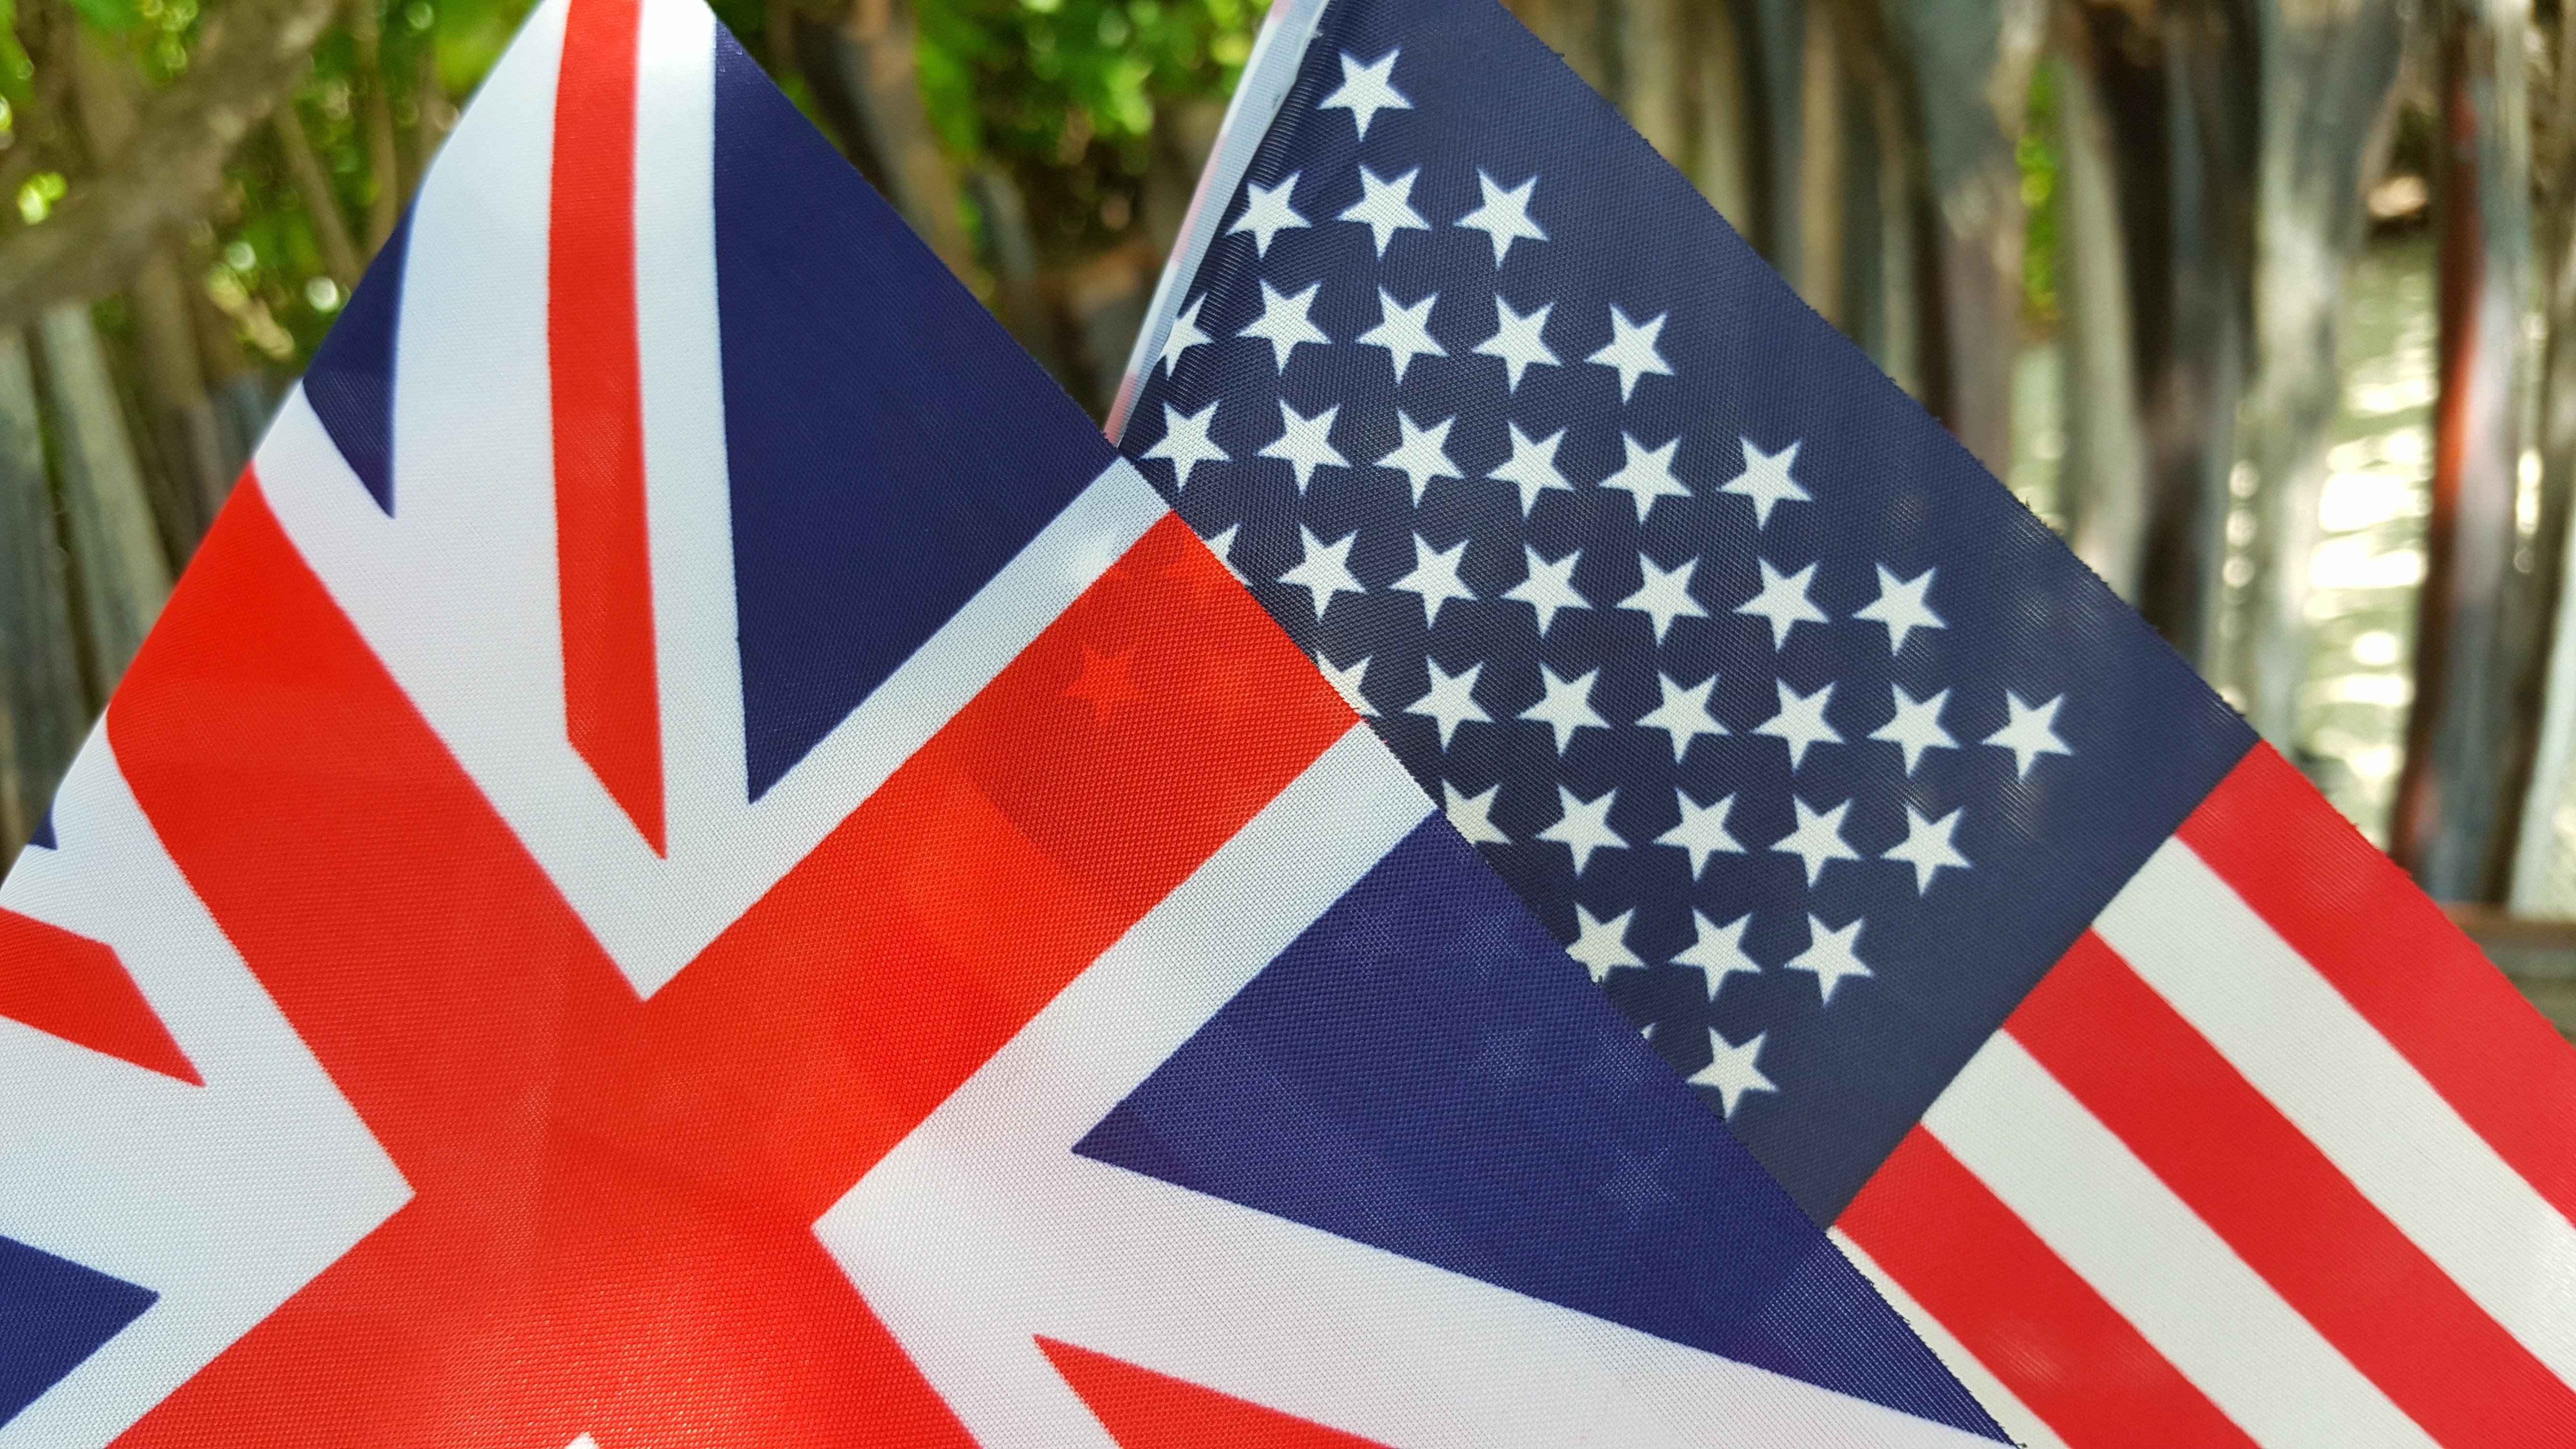 us usa american and uk union jackFlag background